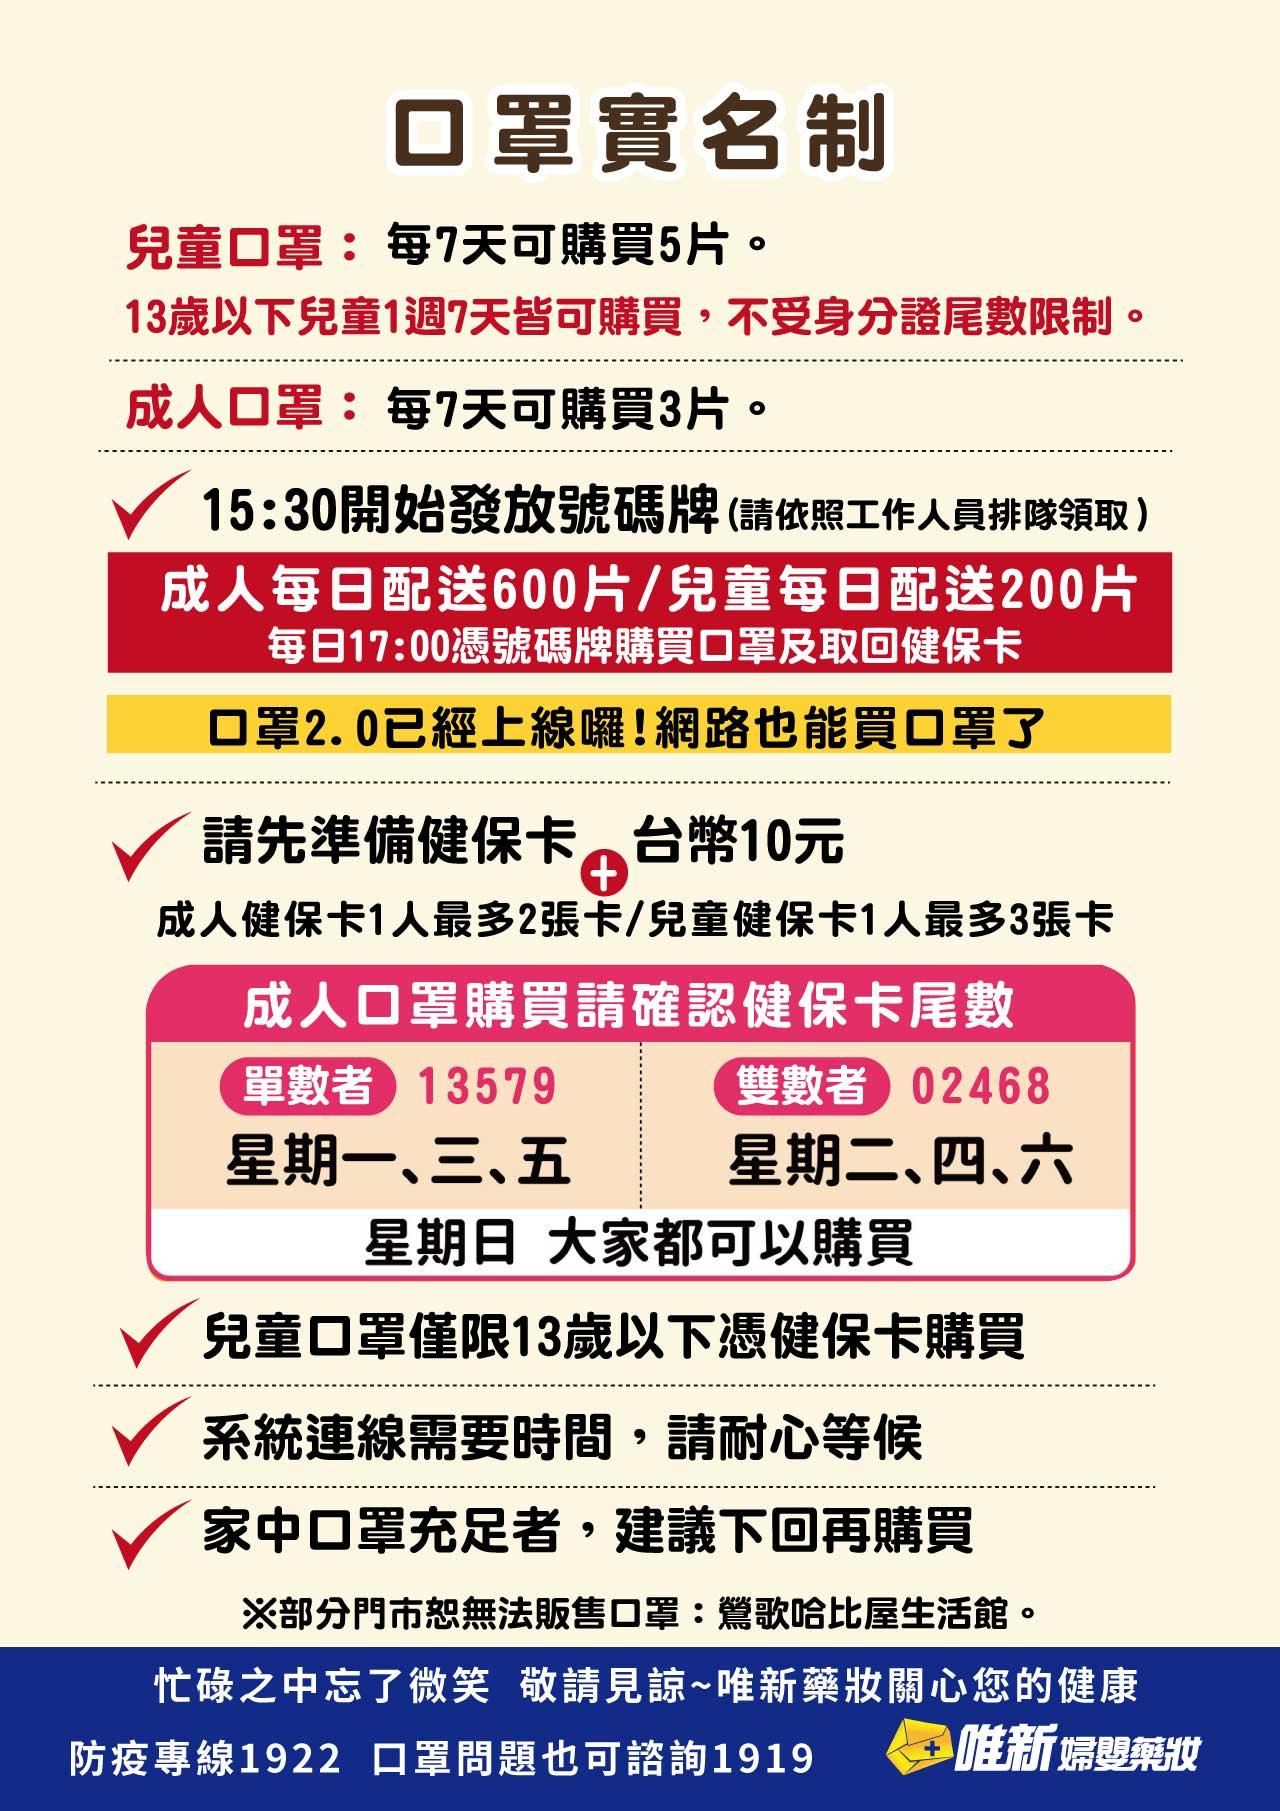 proimages/news/2020/20200319_健保卡領口罩須知.jpg